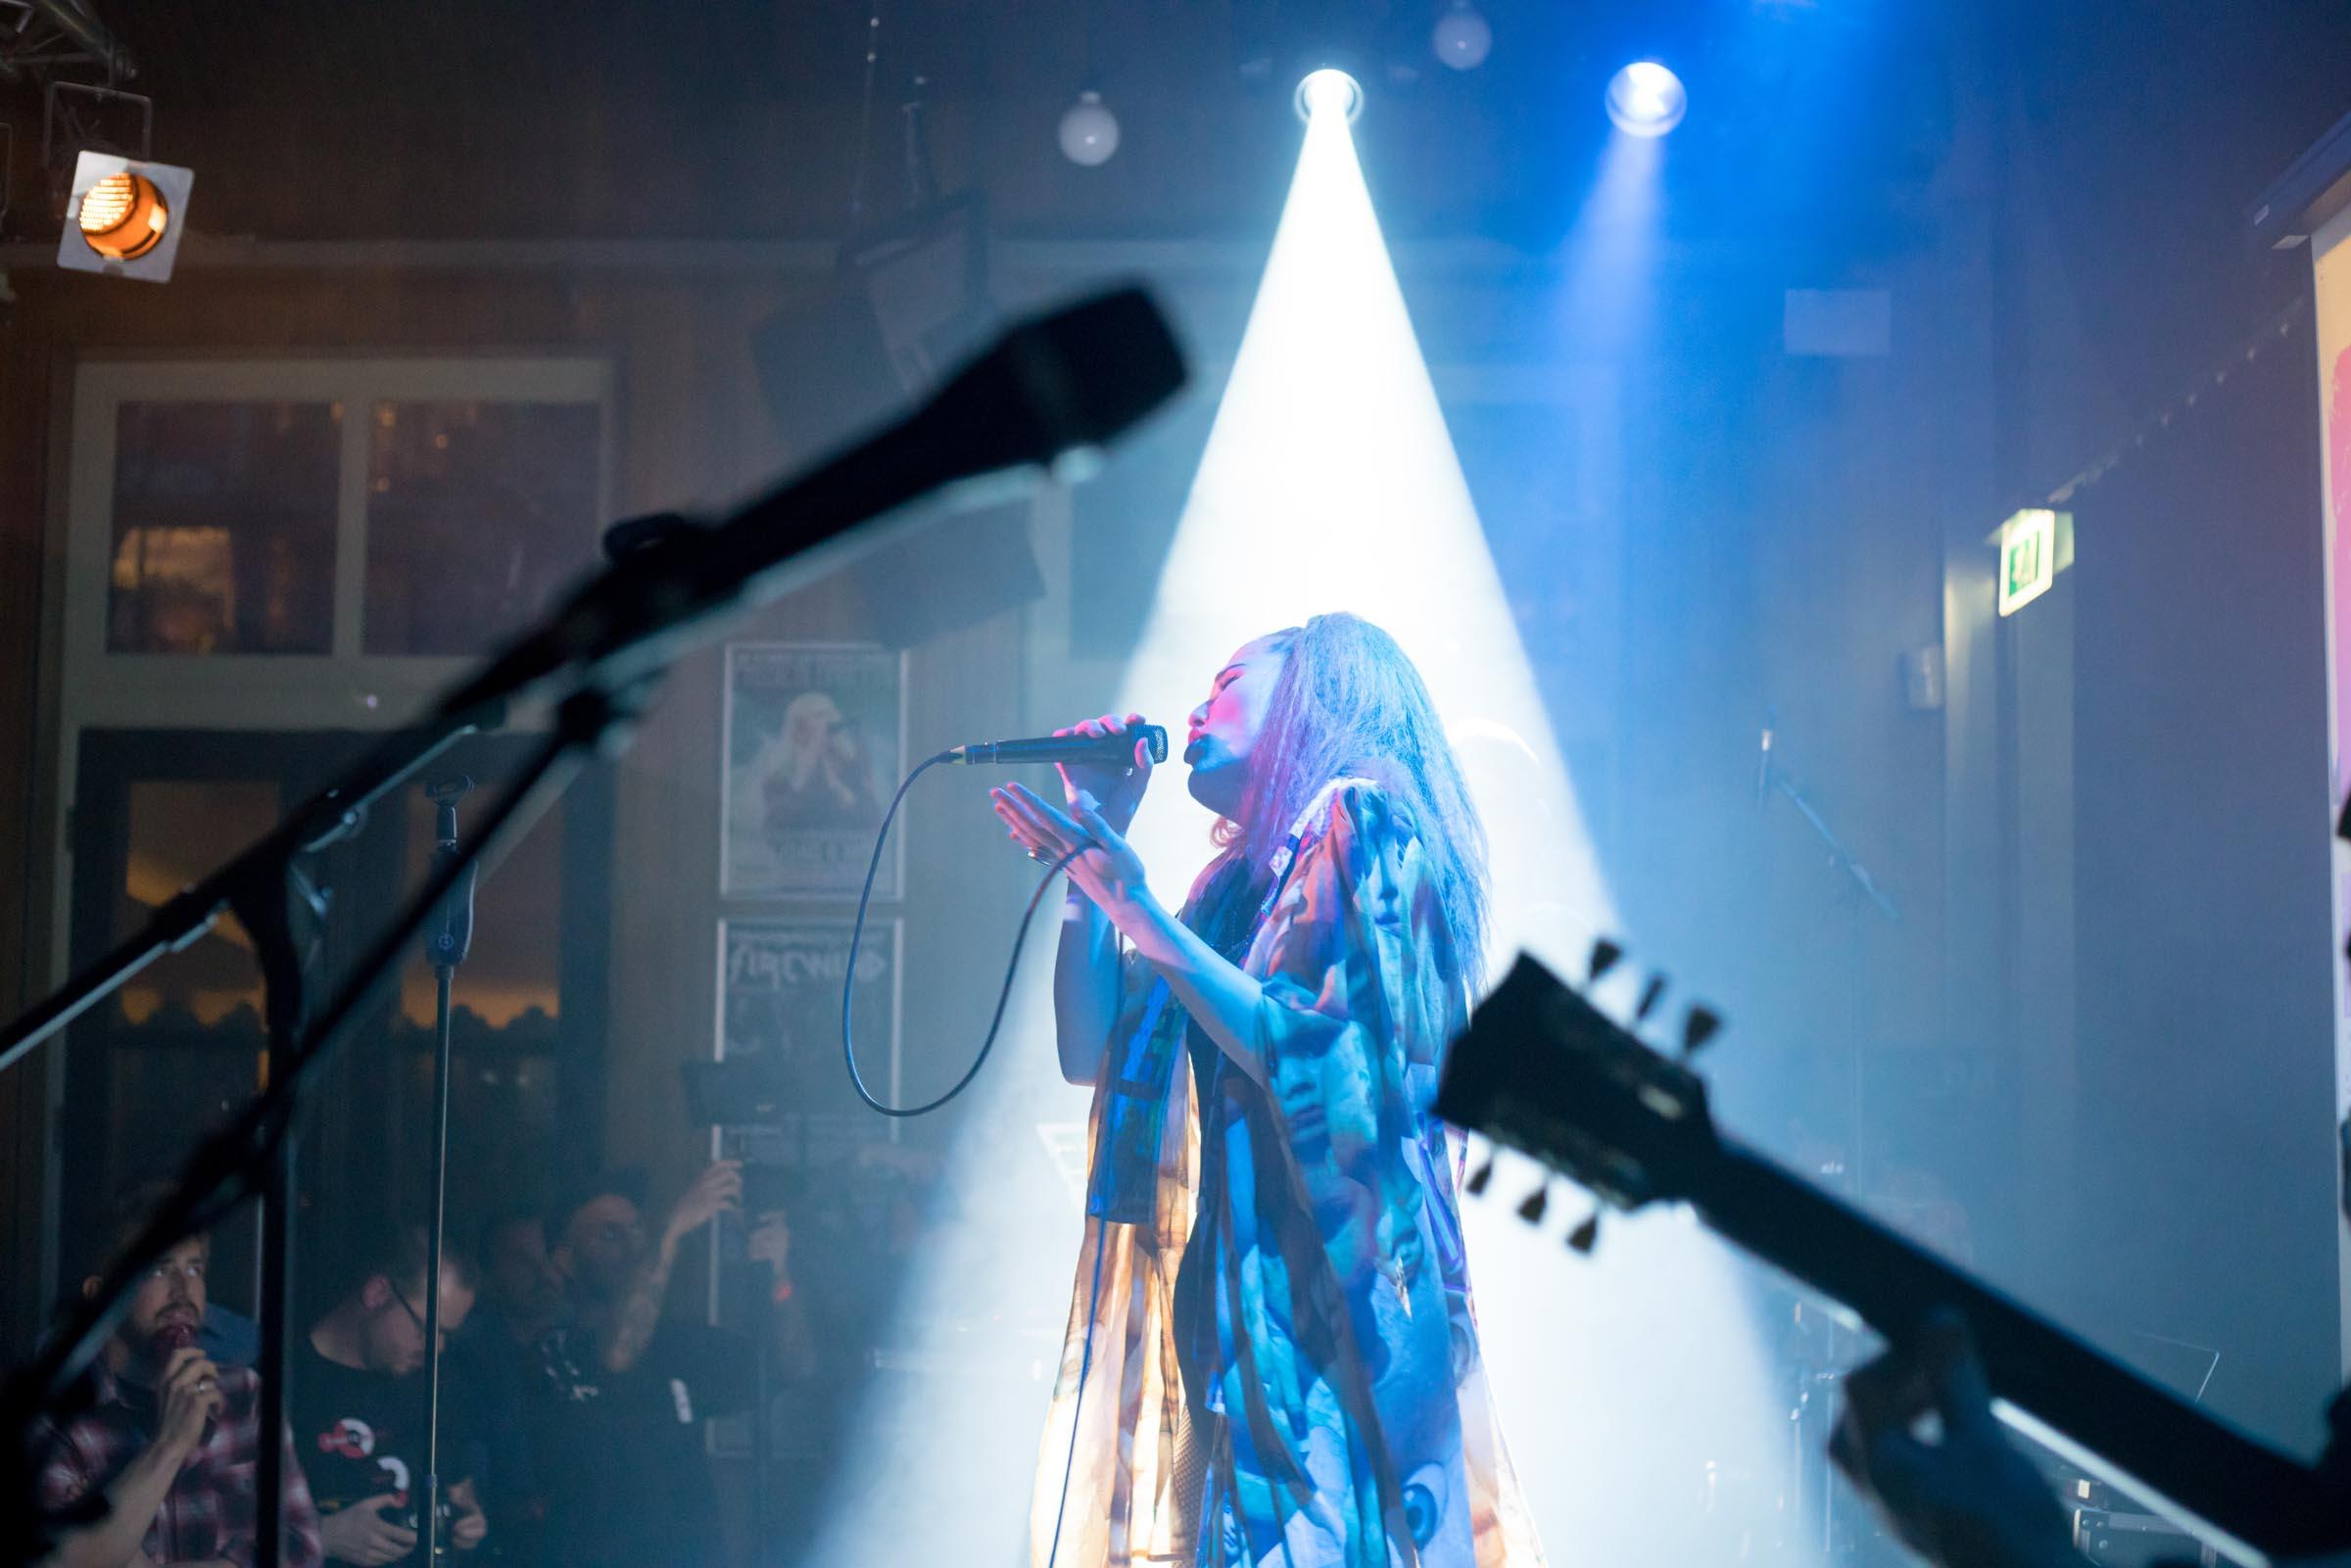 image from Concertfotografie